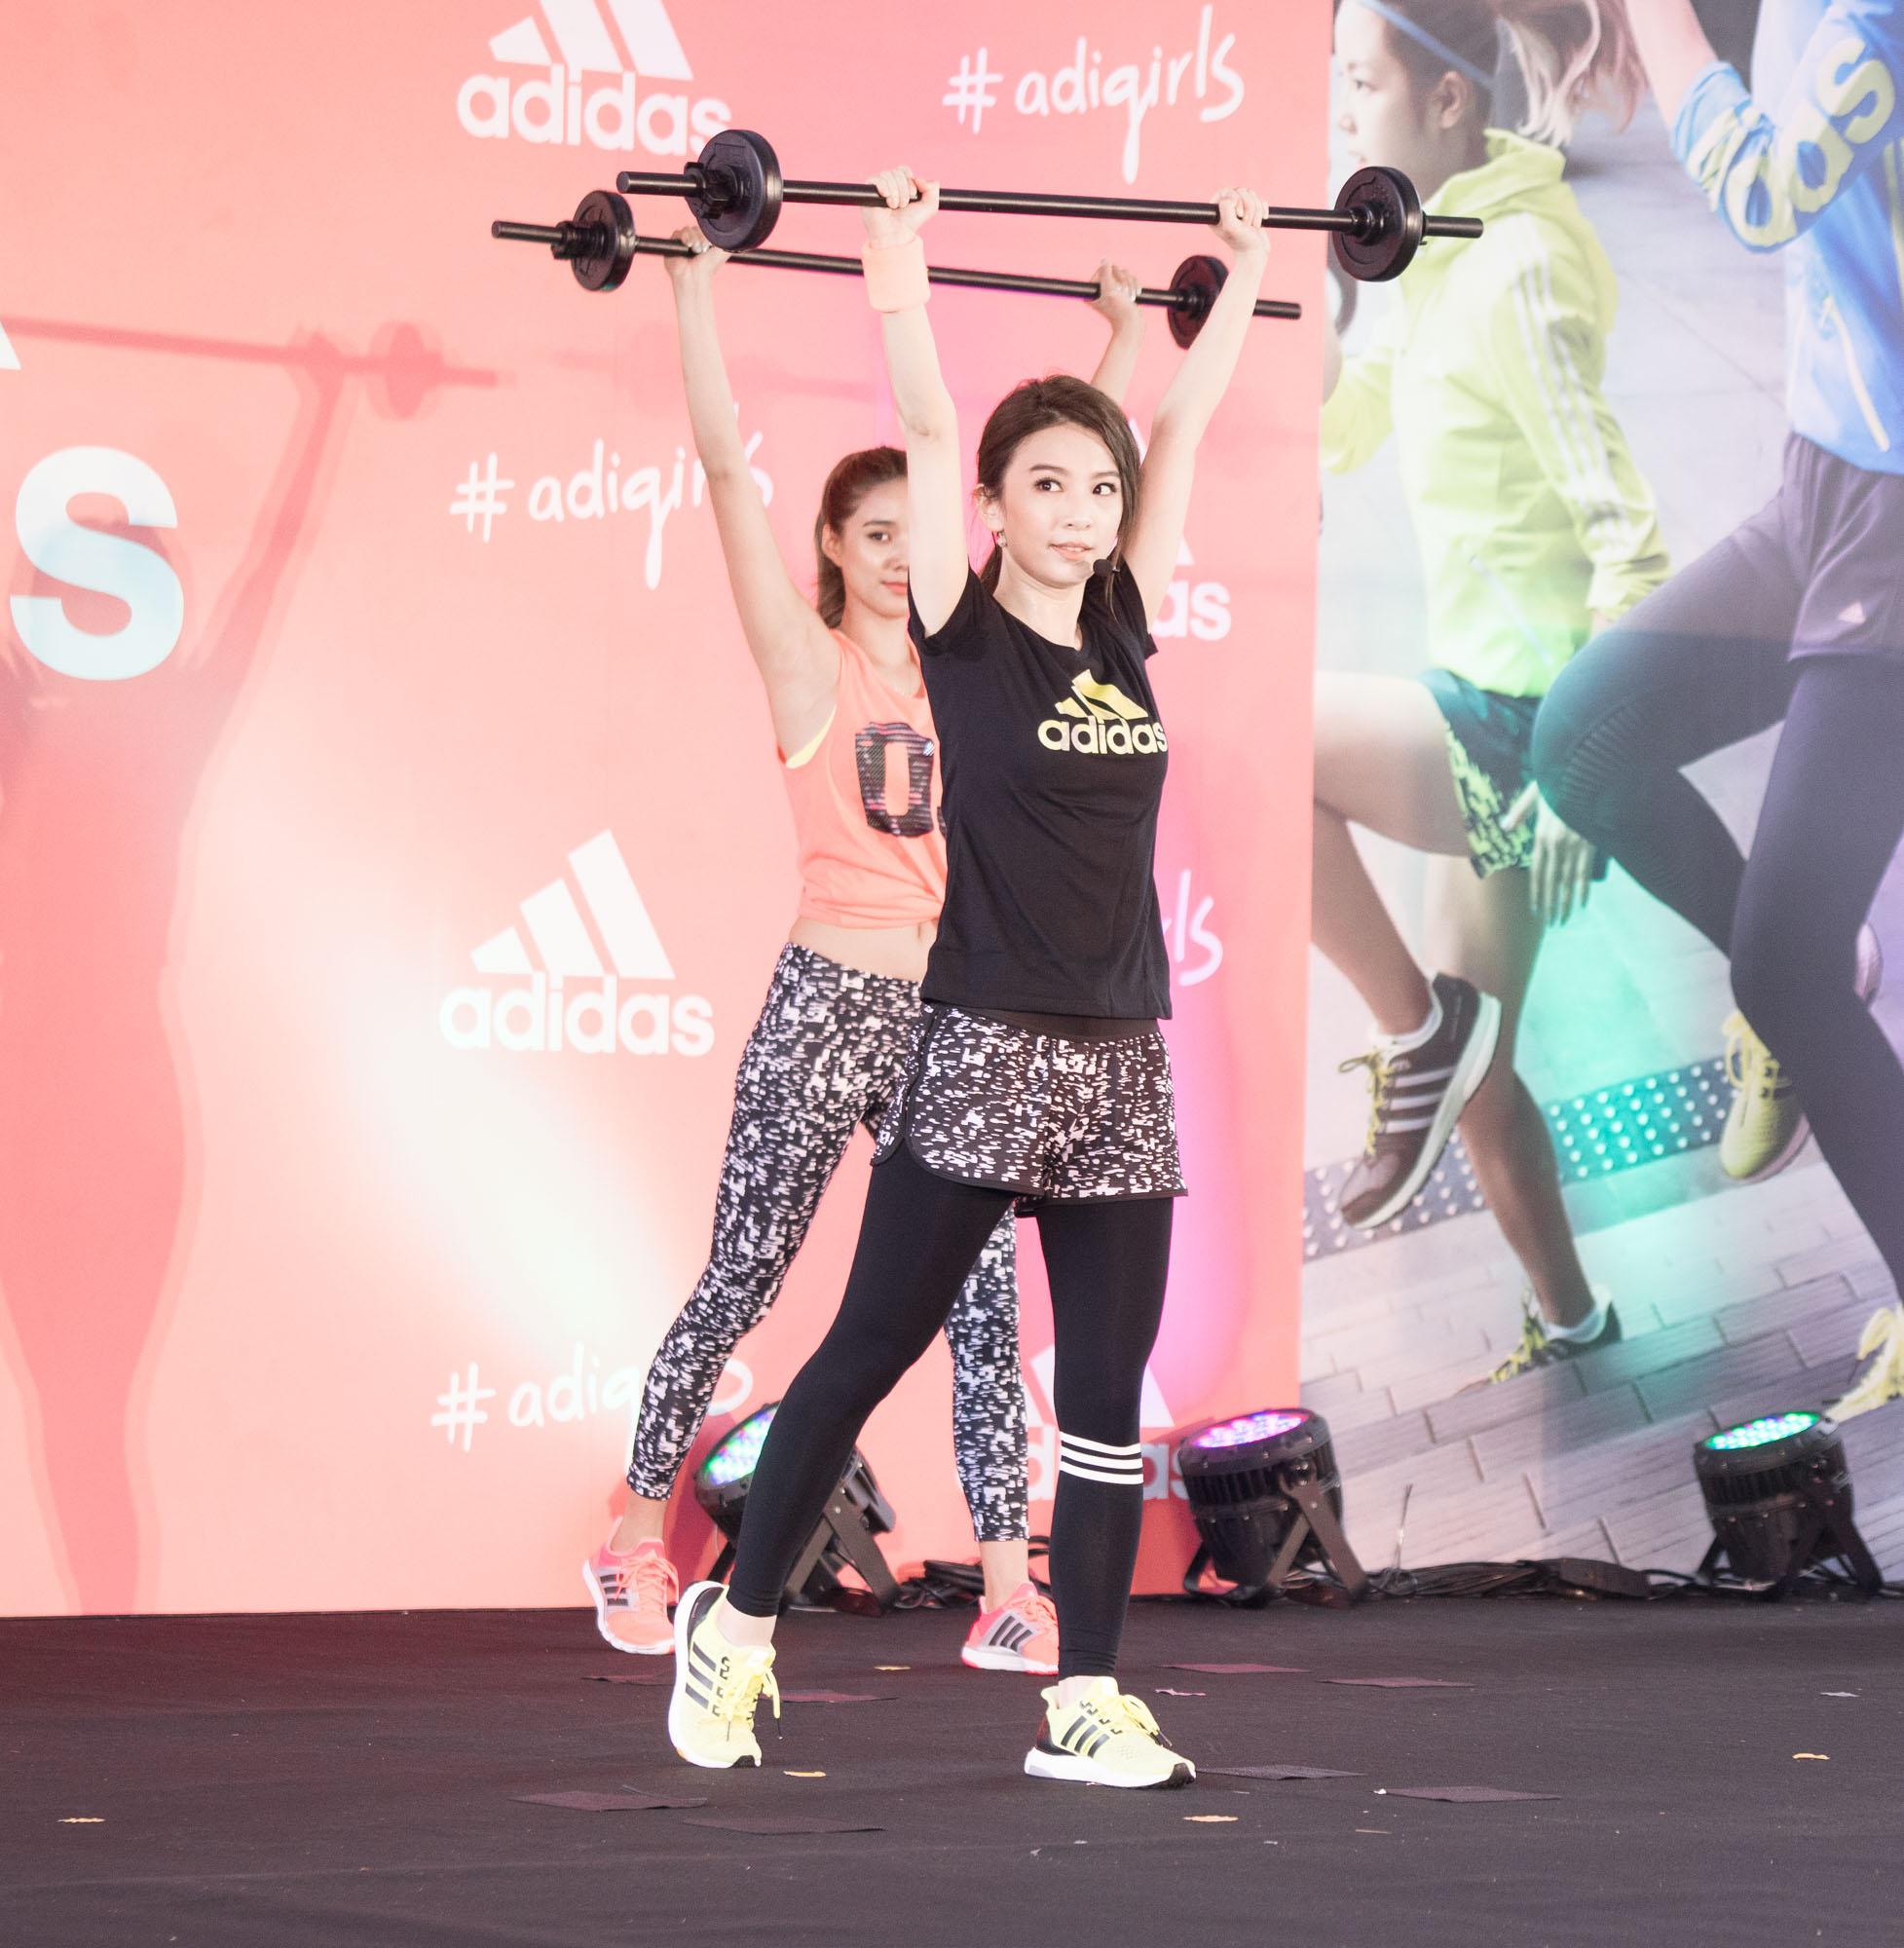 adidas-adigirls press conference 20150924-9